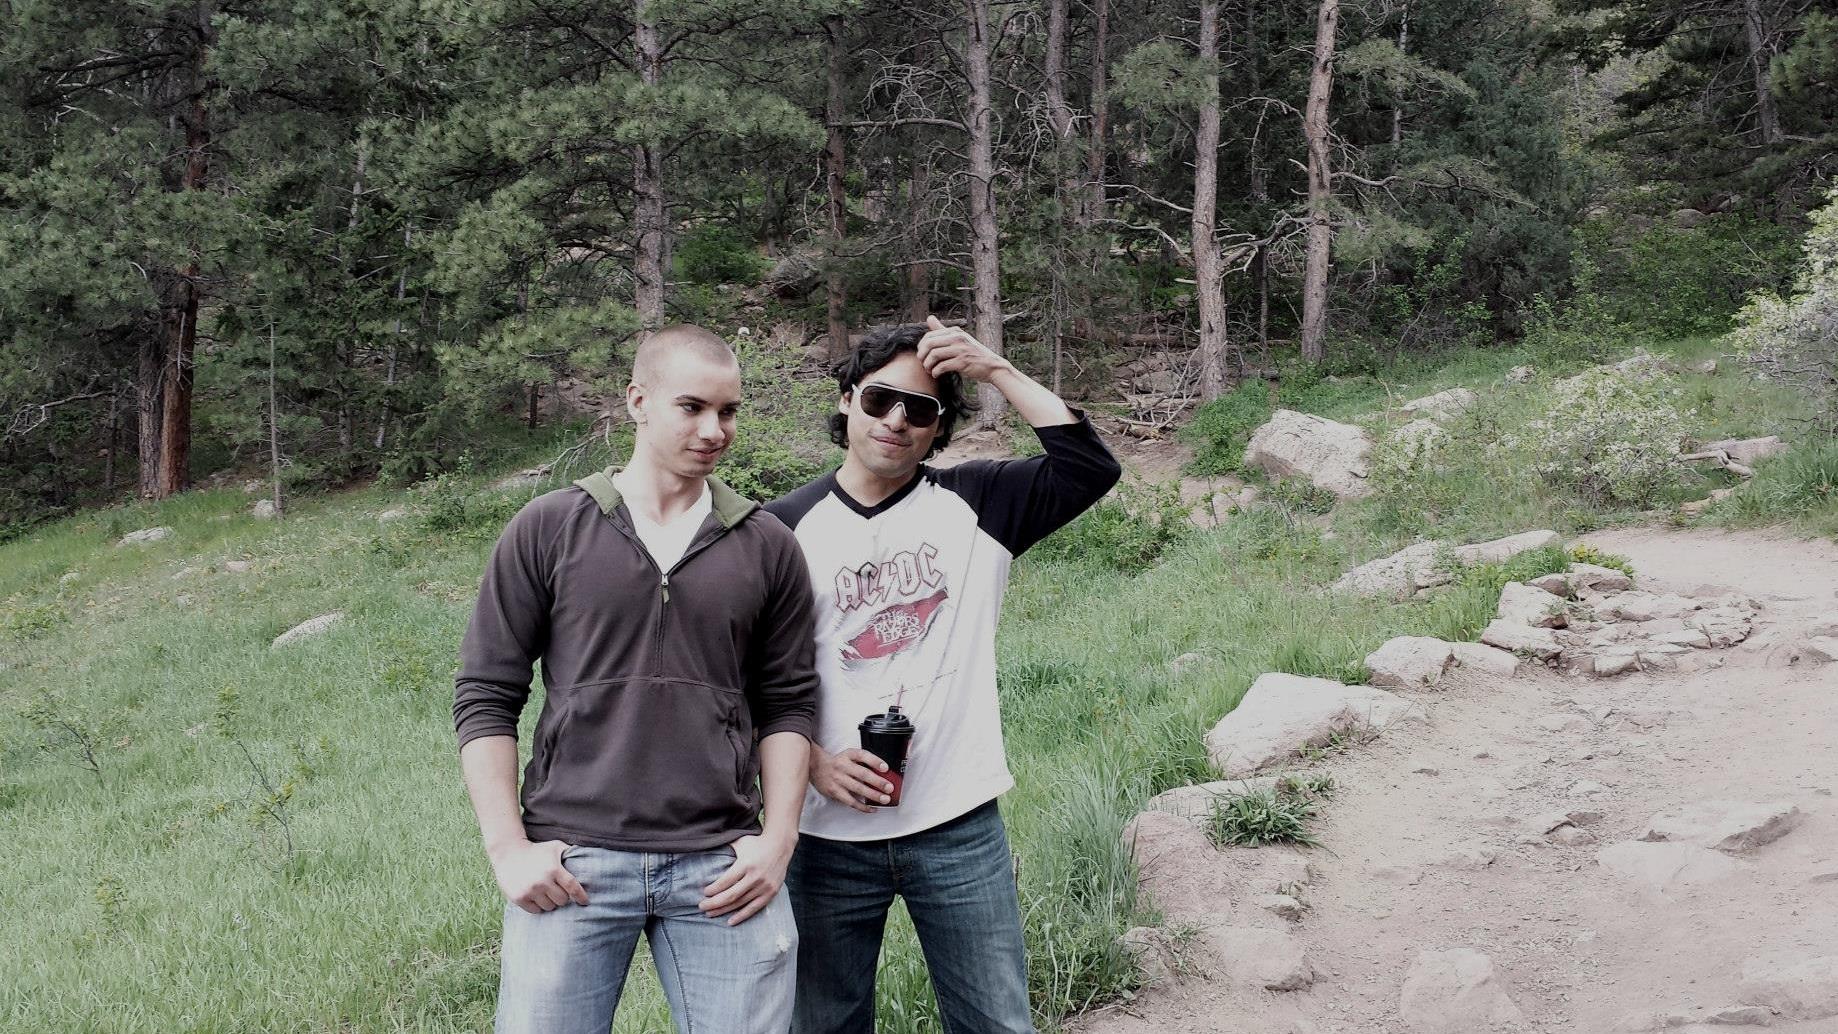 ESL Learn & Explore Program- Hiking in Boulder